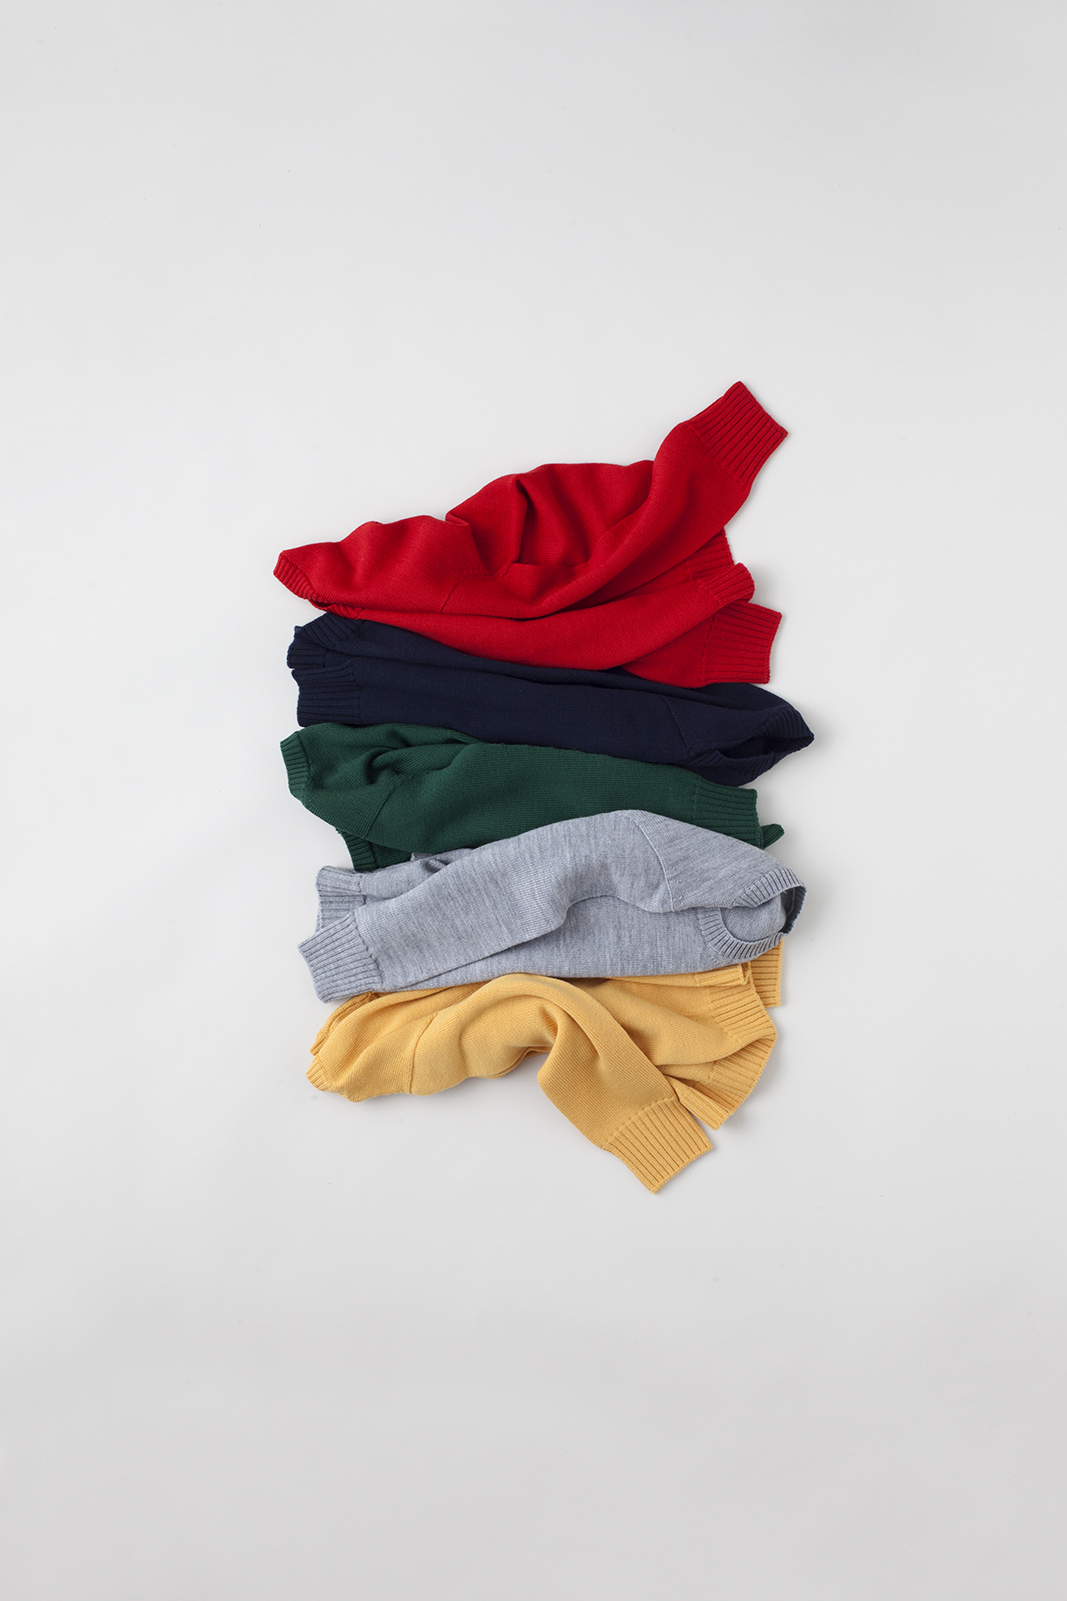 Camphor カンフル kids こども 子供服 familysweater 日本製 madeinjapan